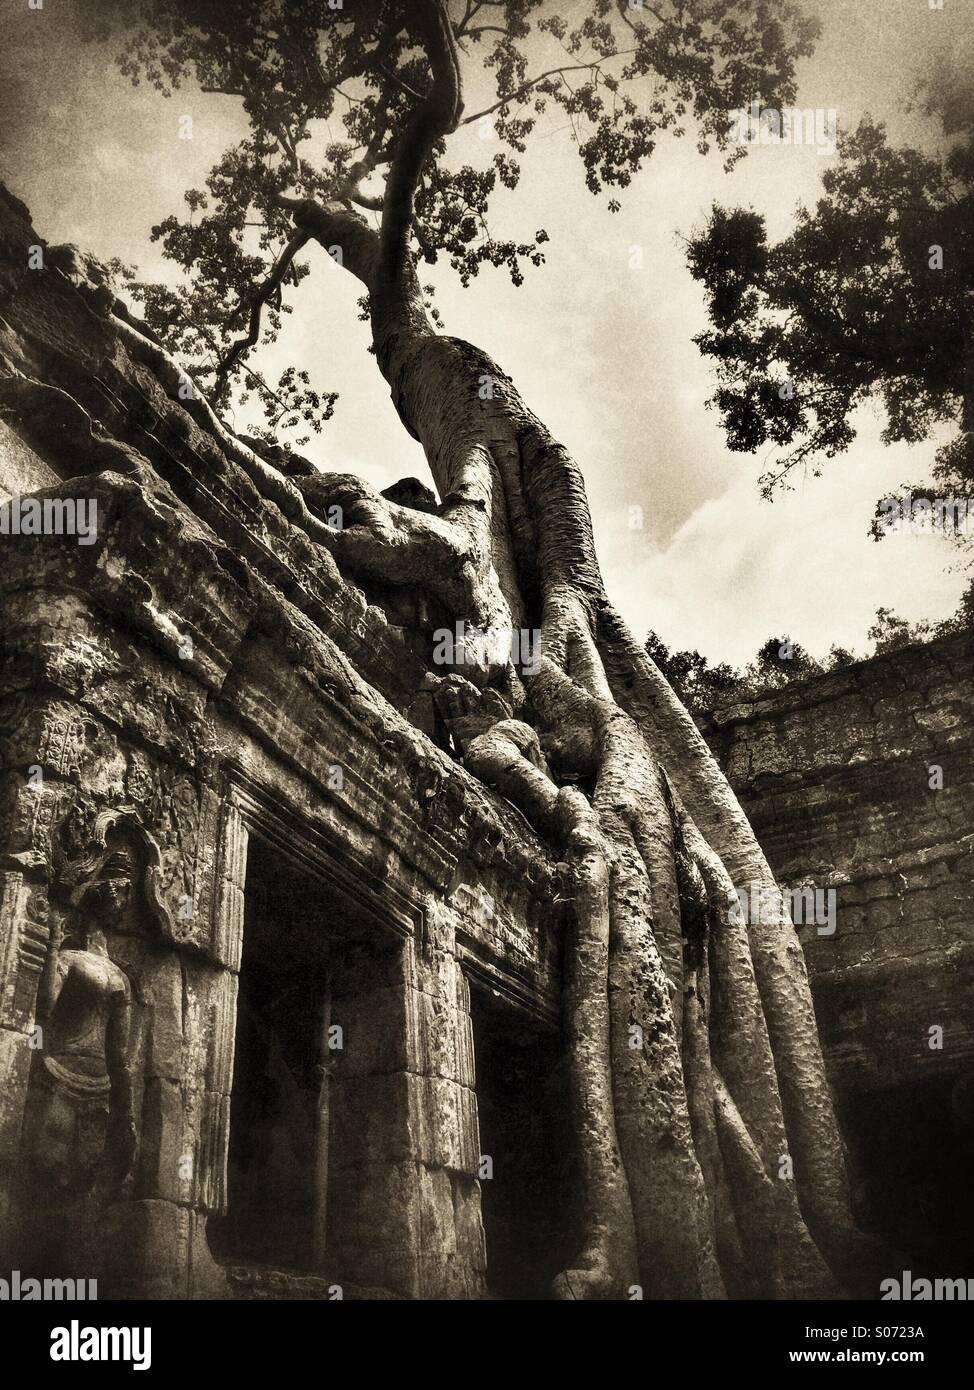 Ta Prohm temple Cambodia, location of Lara Croft Tomb Raider movie - Stock Image